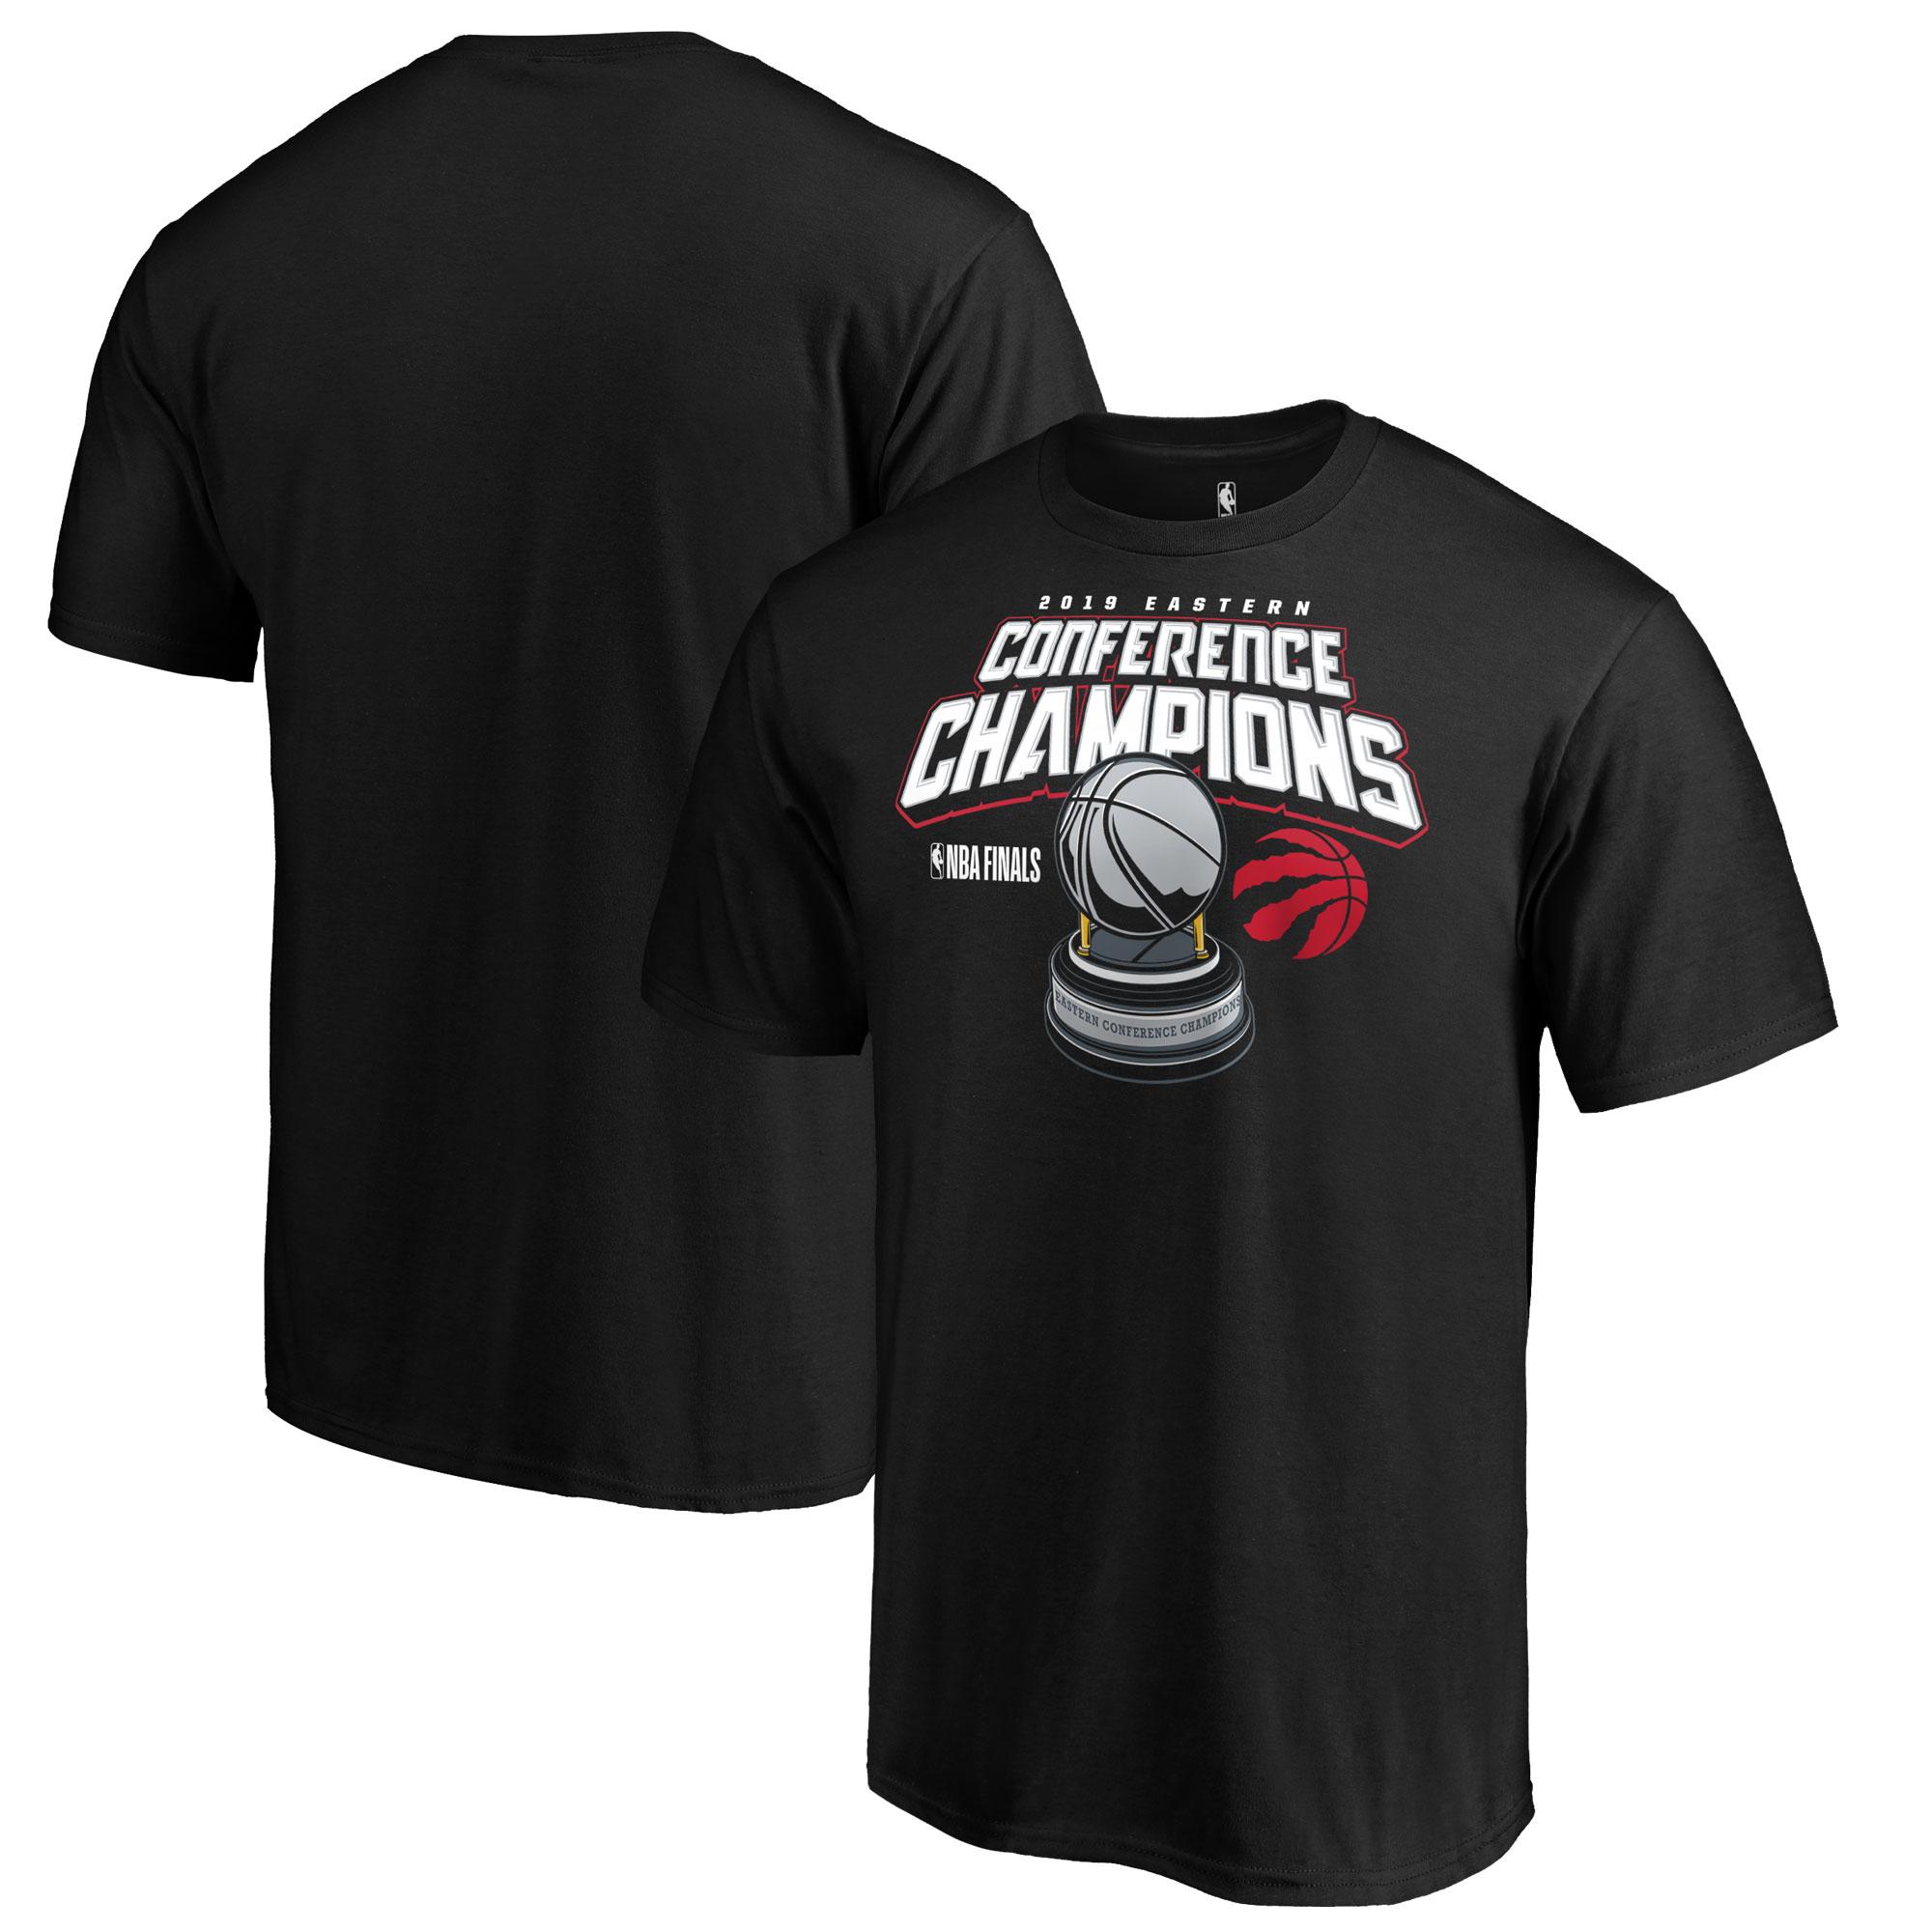 Toronto Raptors Fanatics Branded 2019 Eastern Conference Champions Level of Desire T-Shirt - Black